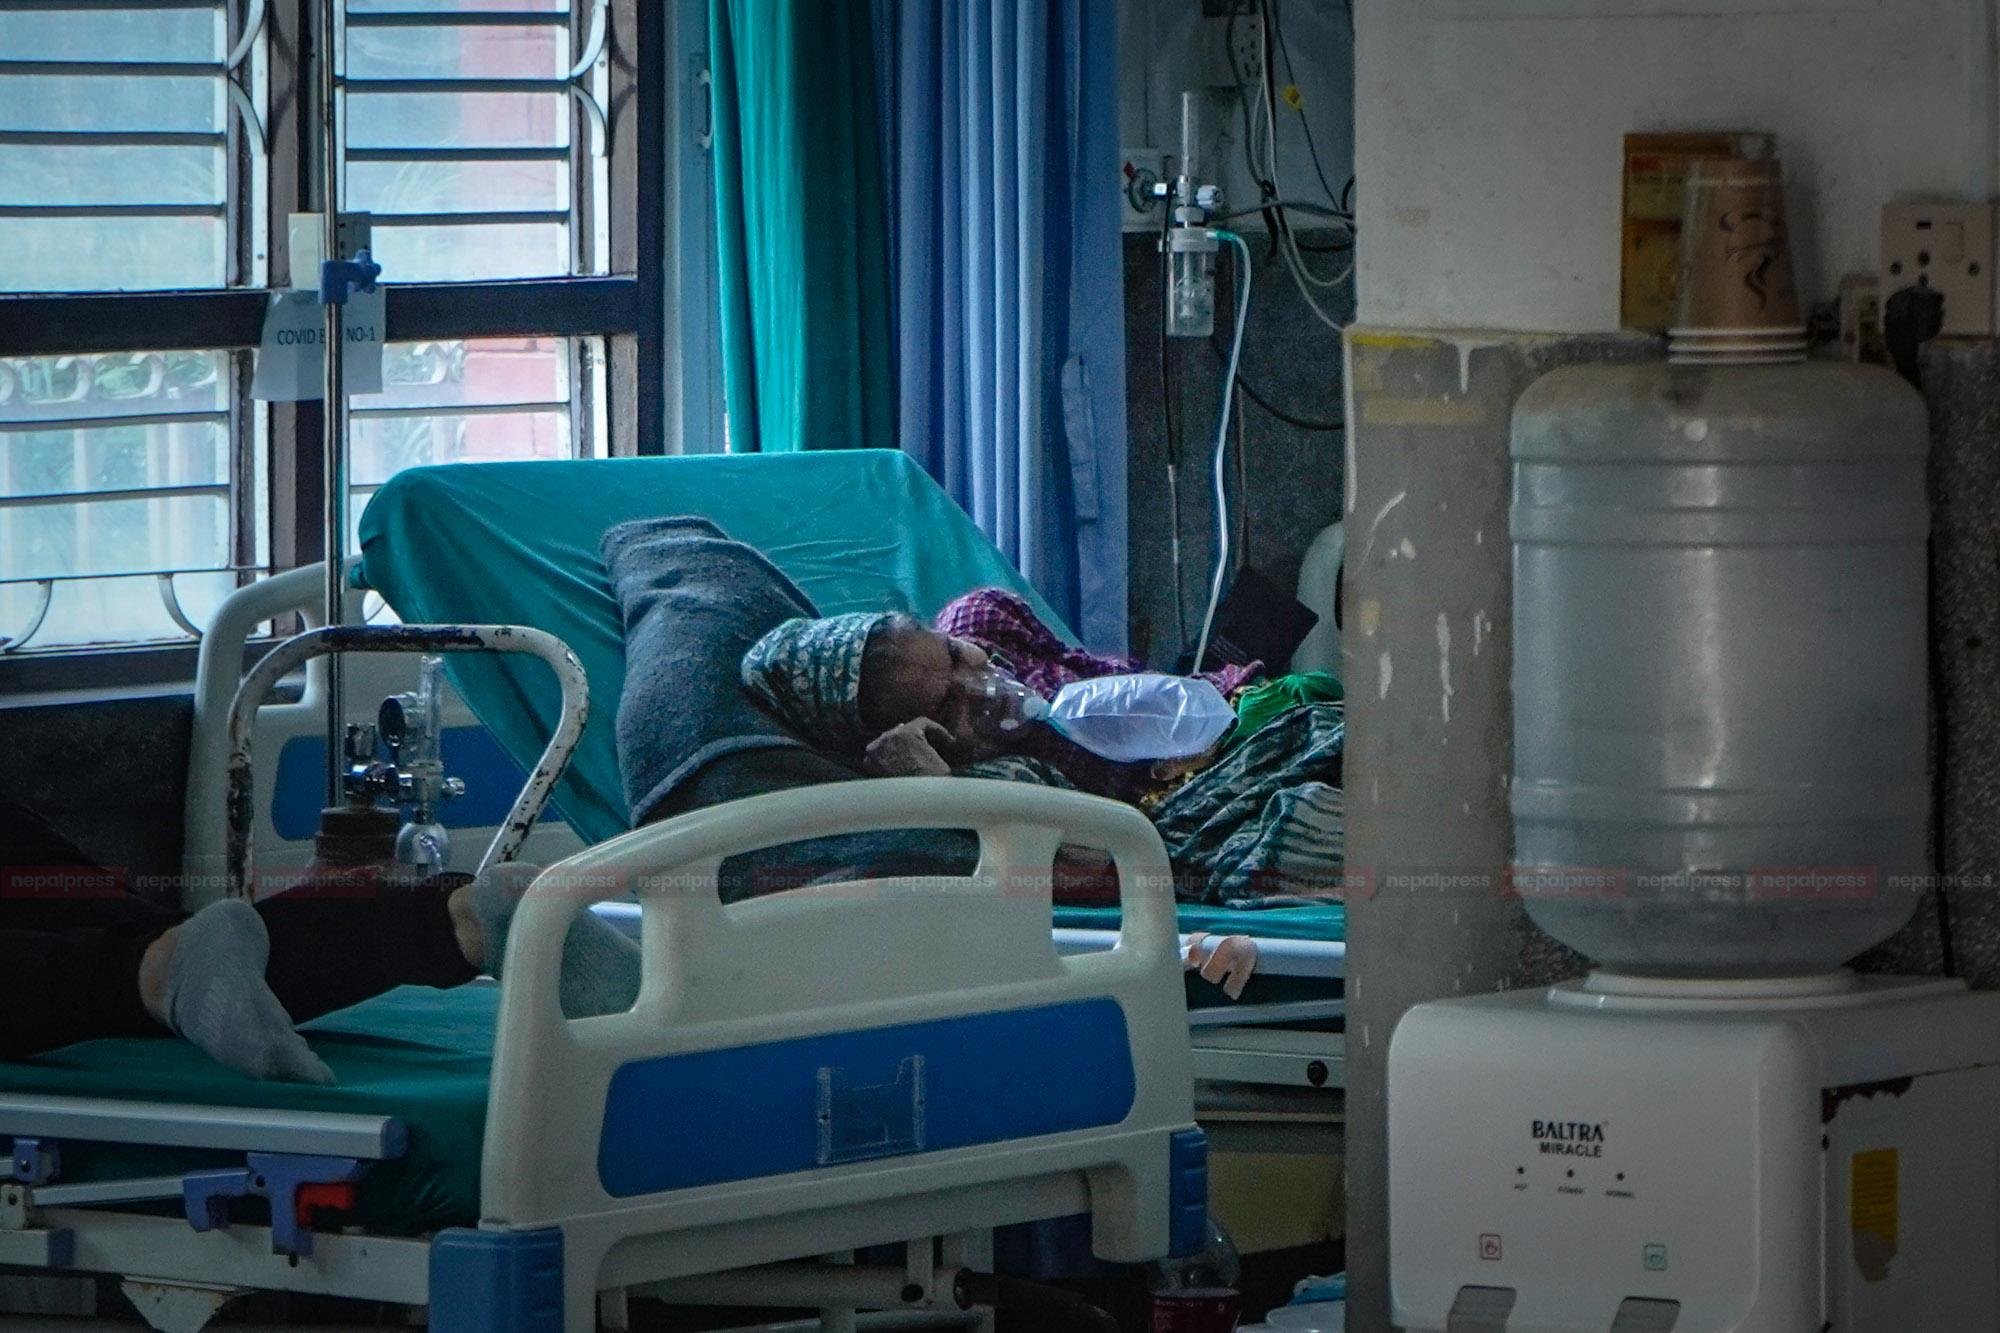 तत्काल थप चार कोभिड अस्पताल चाहियो – डीसीसीएमसी धनुषा